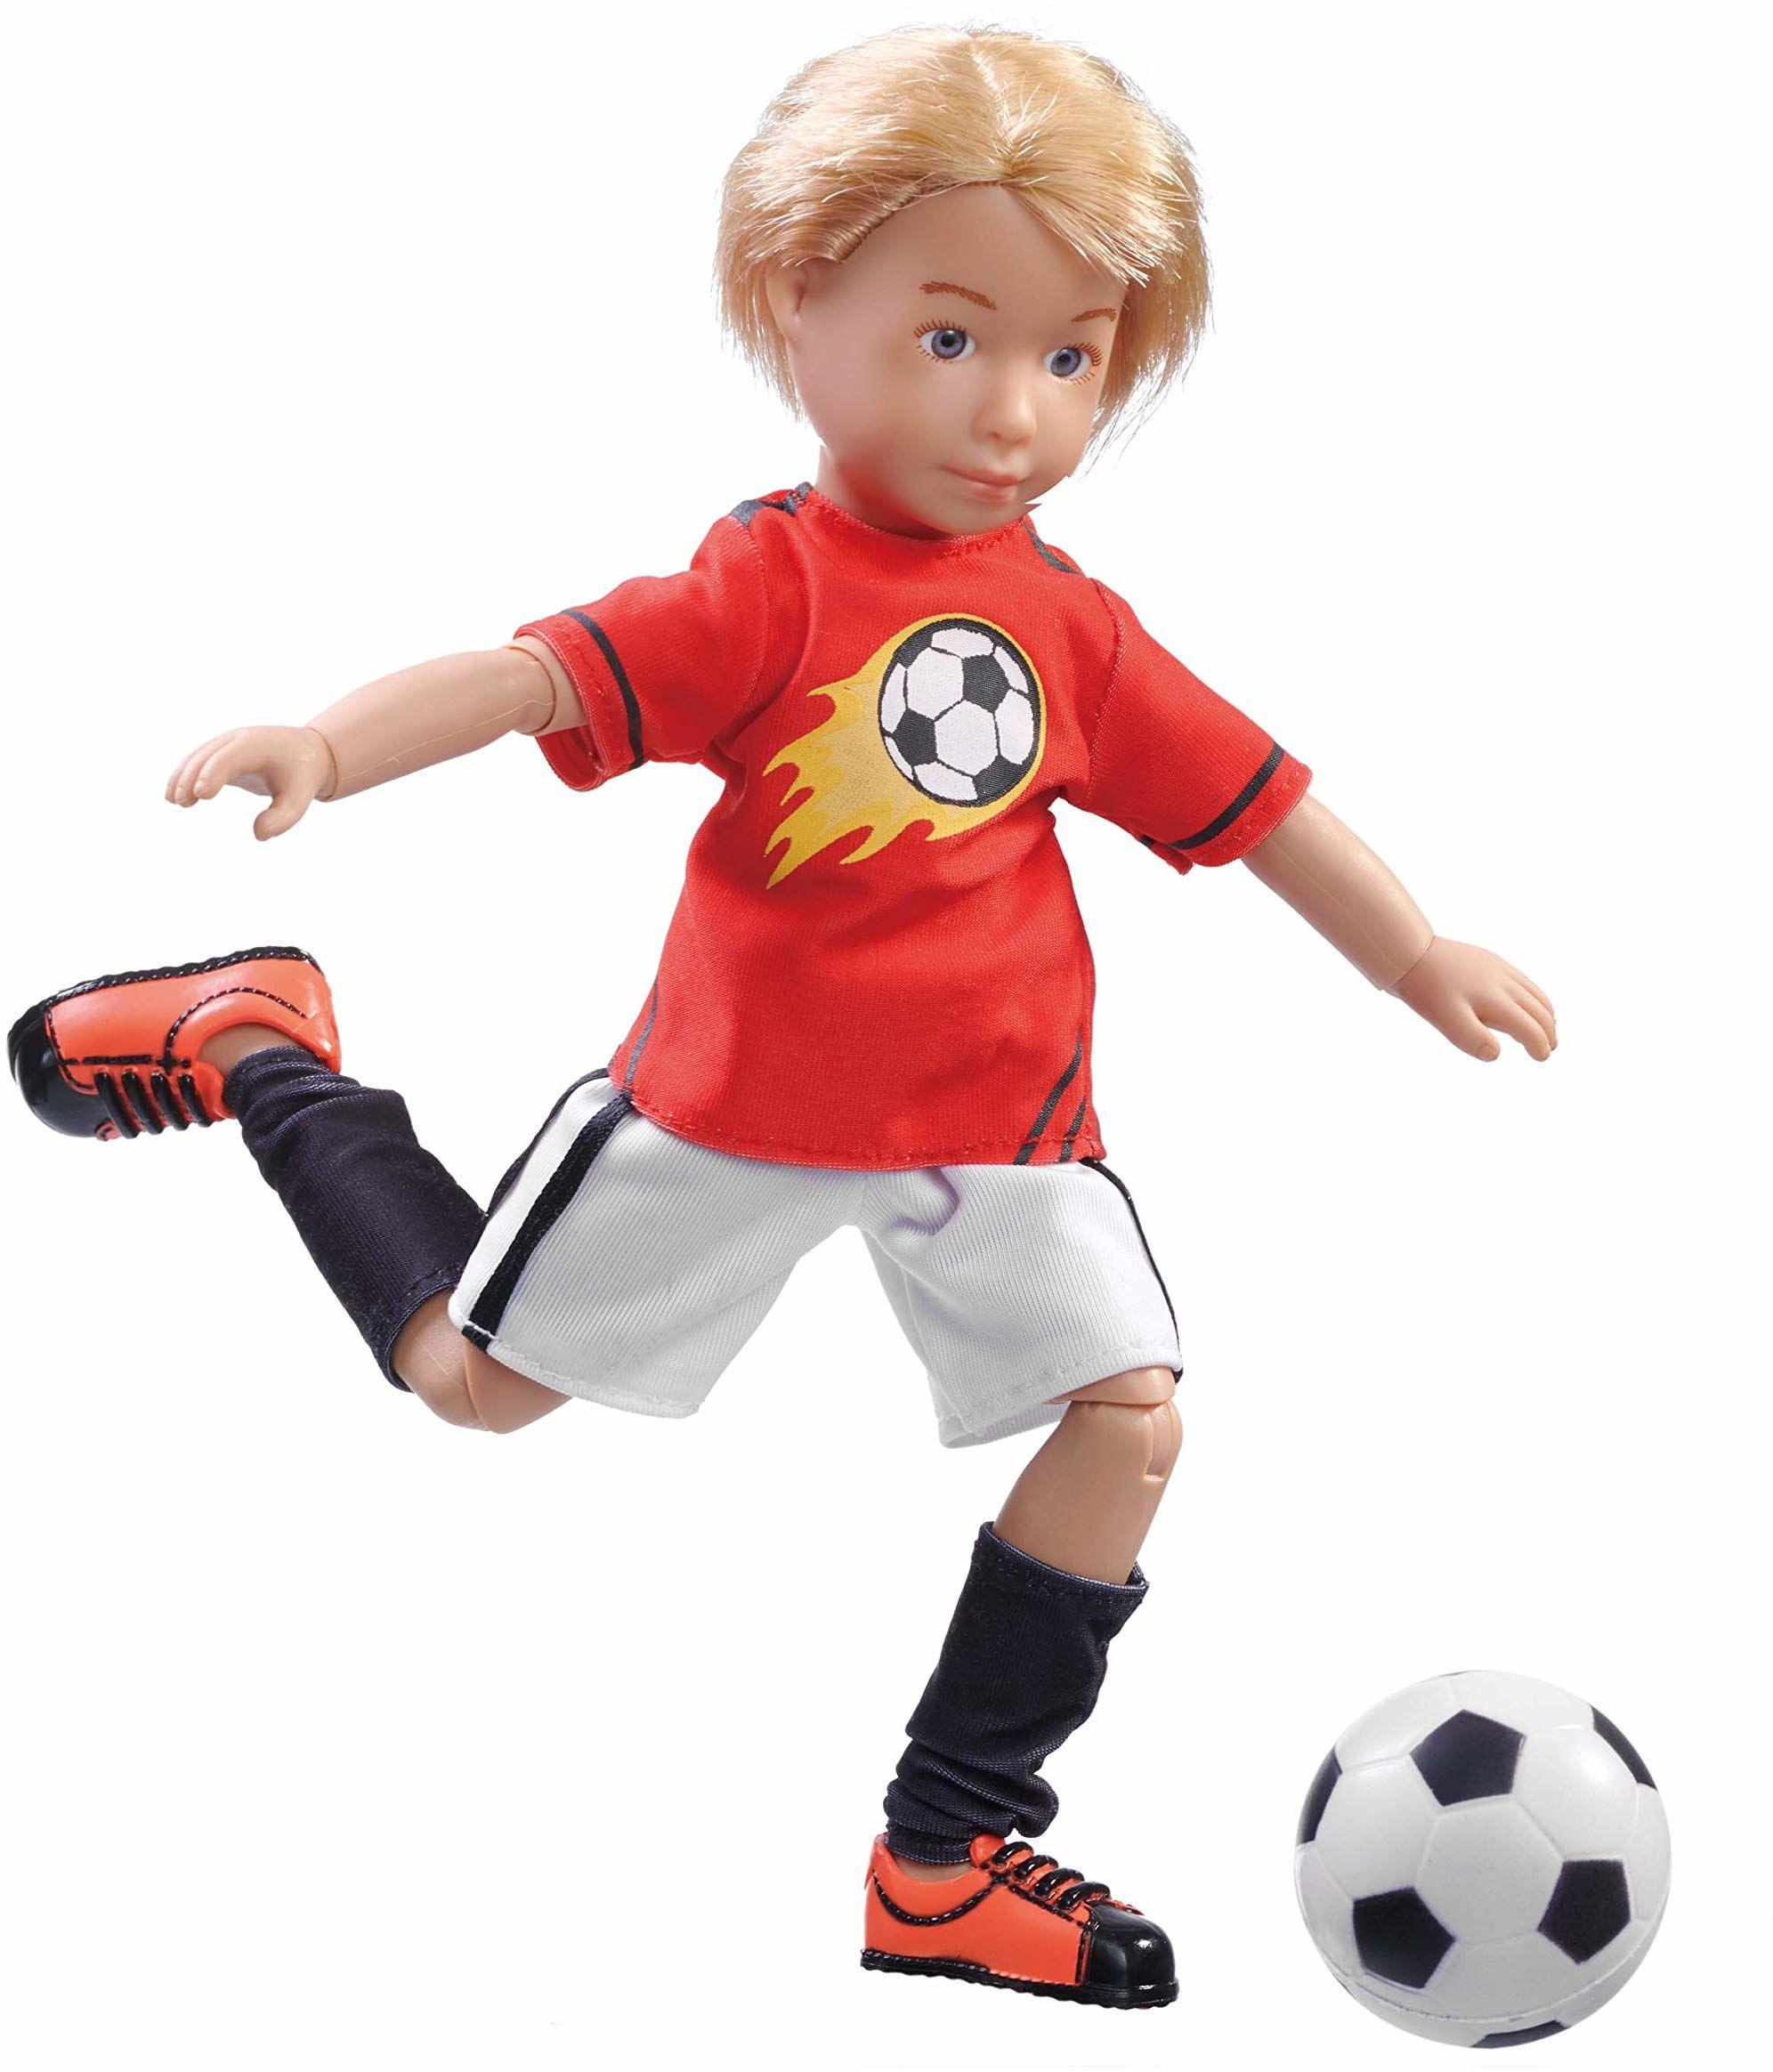 Käthe Kruse 0126850 Michael piłka nożna, czerwona